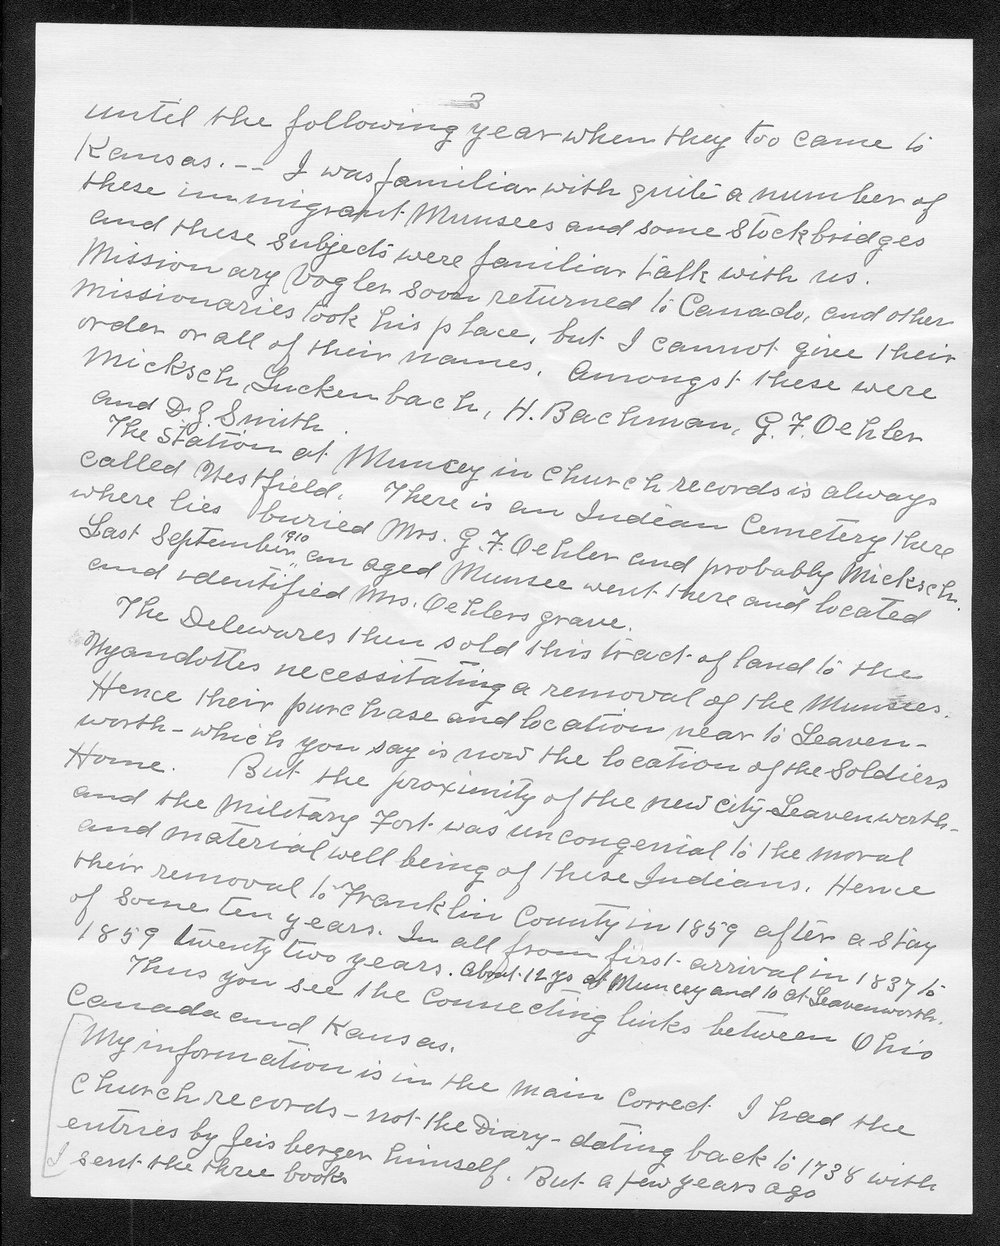 Joseph Romig to George W. Martin - 3